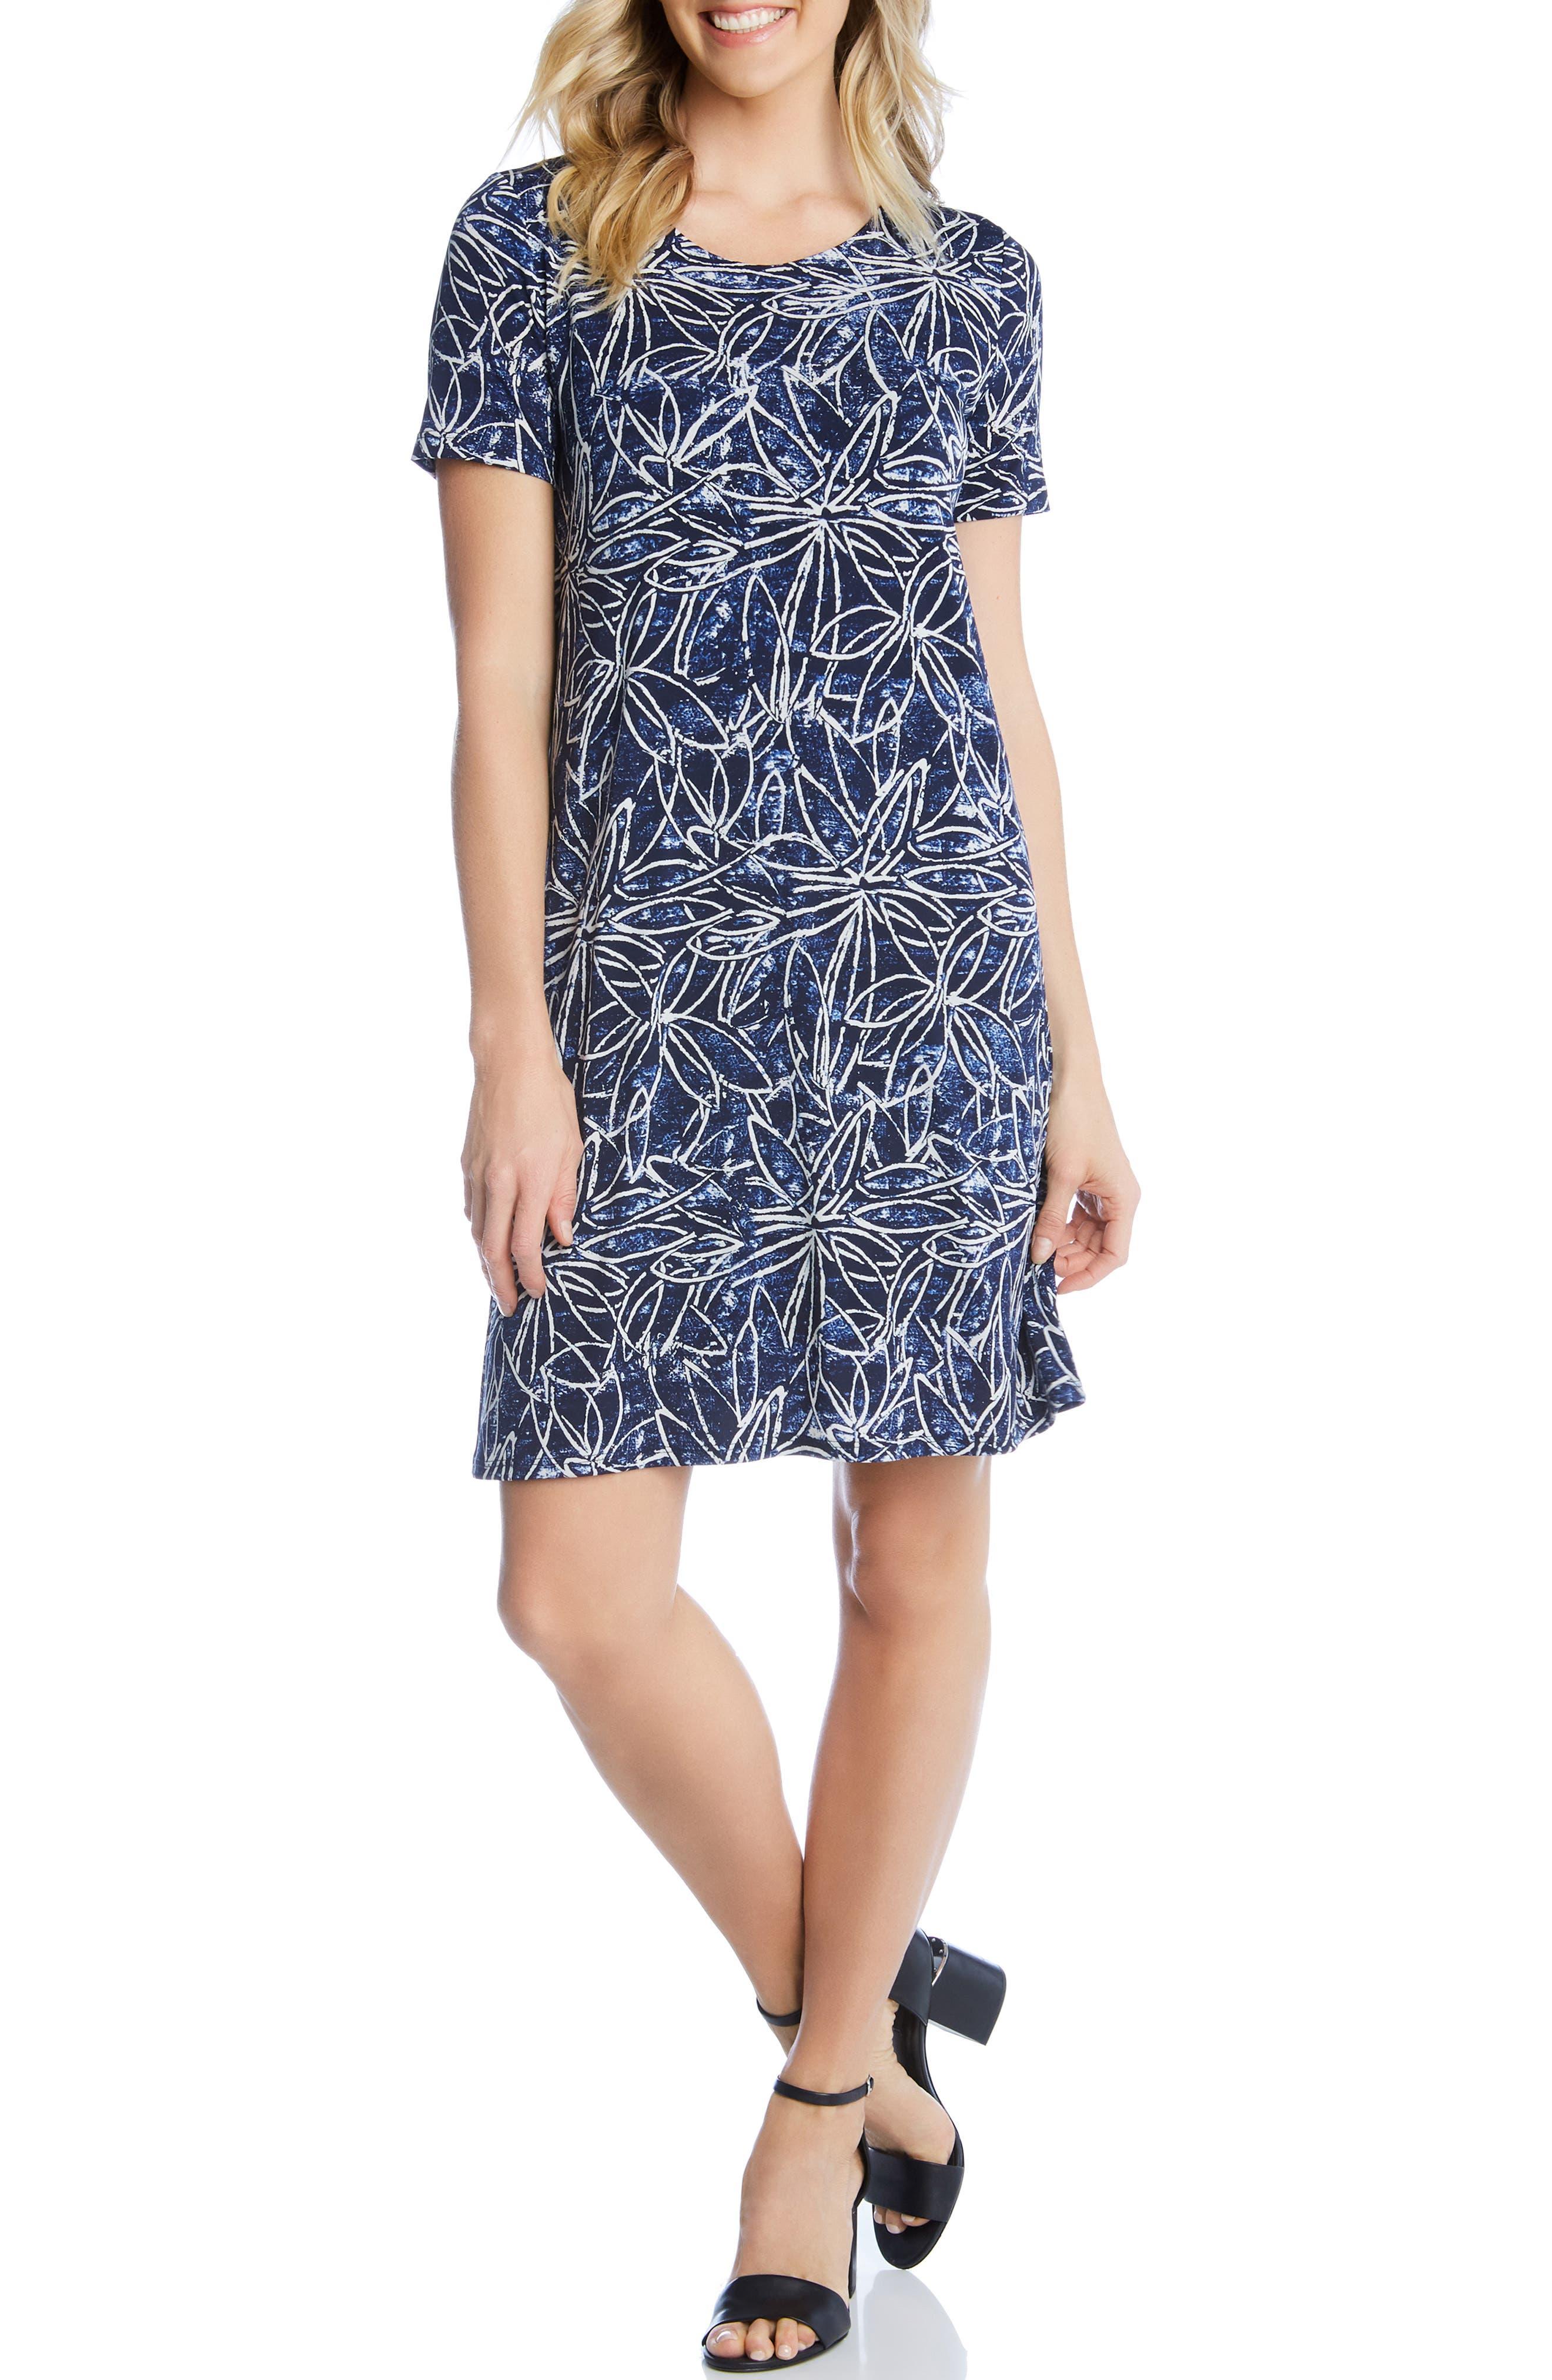 KAREN KANE, Floral Print Shift Dress, Main thumbnail 1, color, PRINT